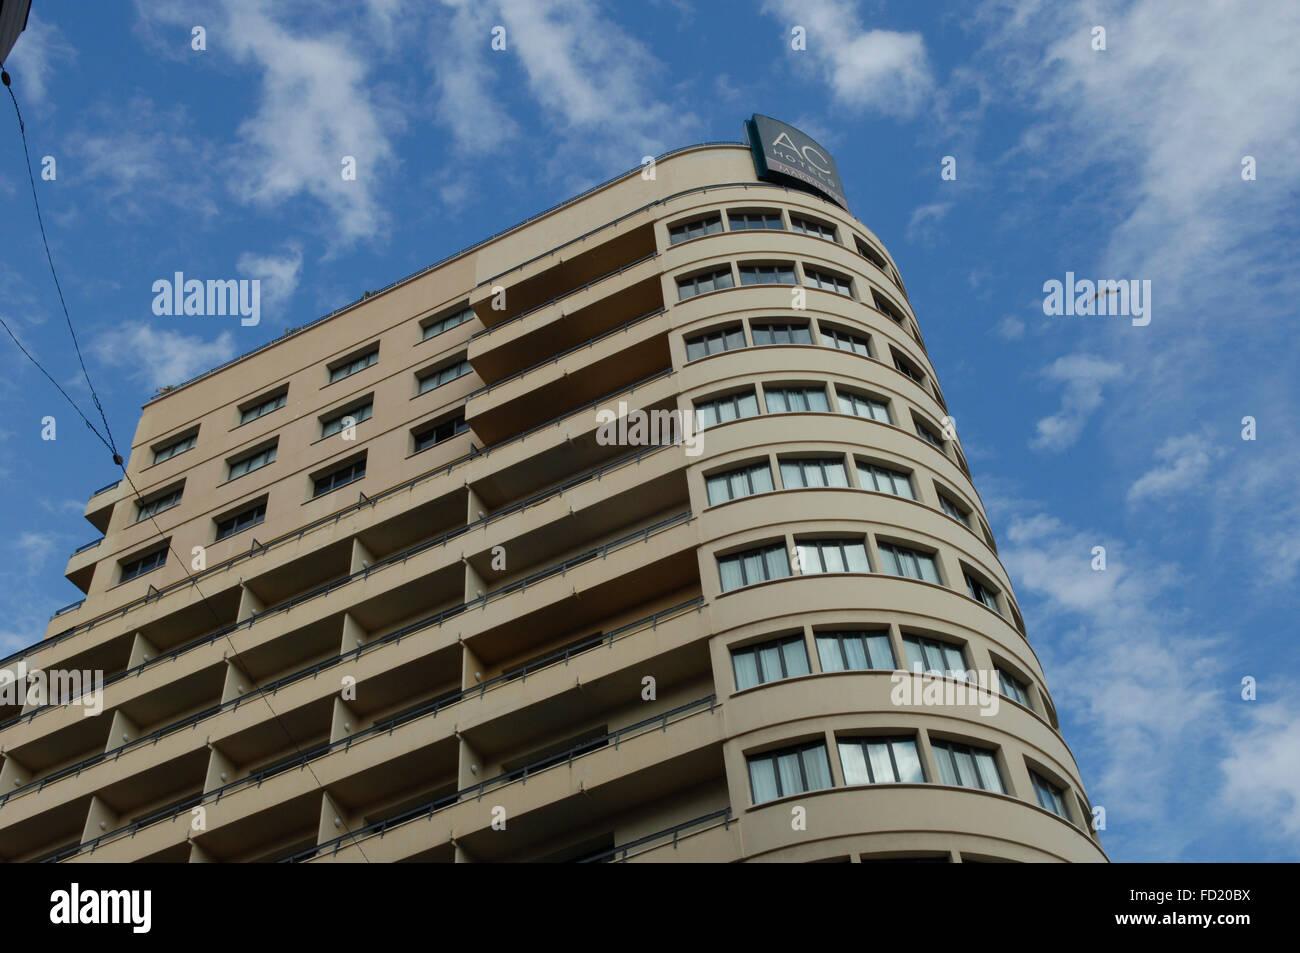 Ac Hotel Malaga Palacio Stockfotos Ac Hotel Malaga Palacio Bilder